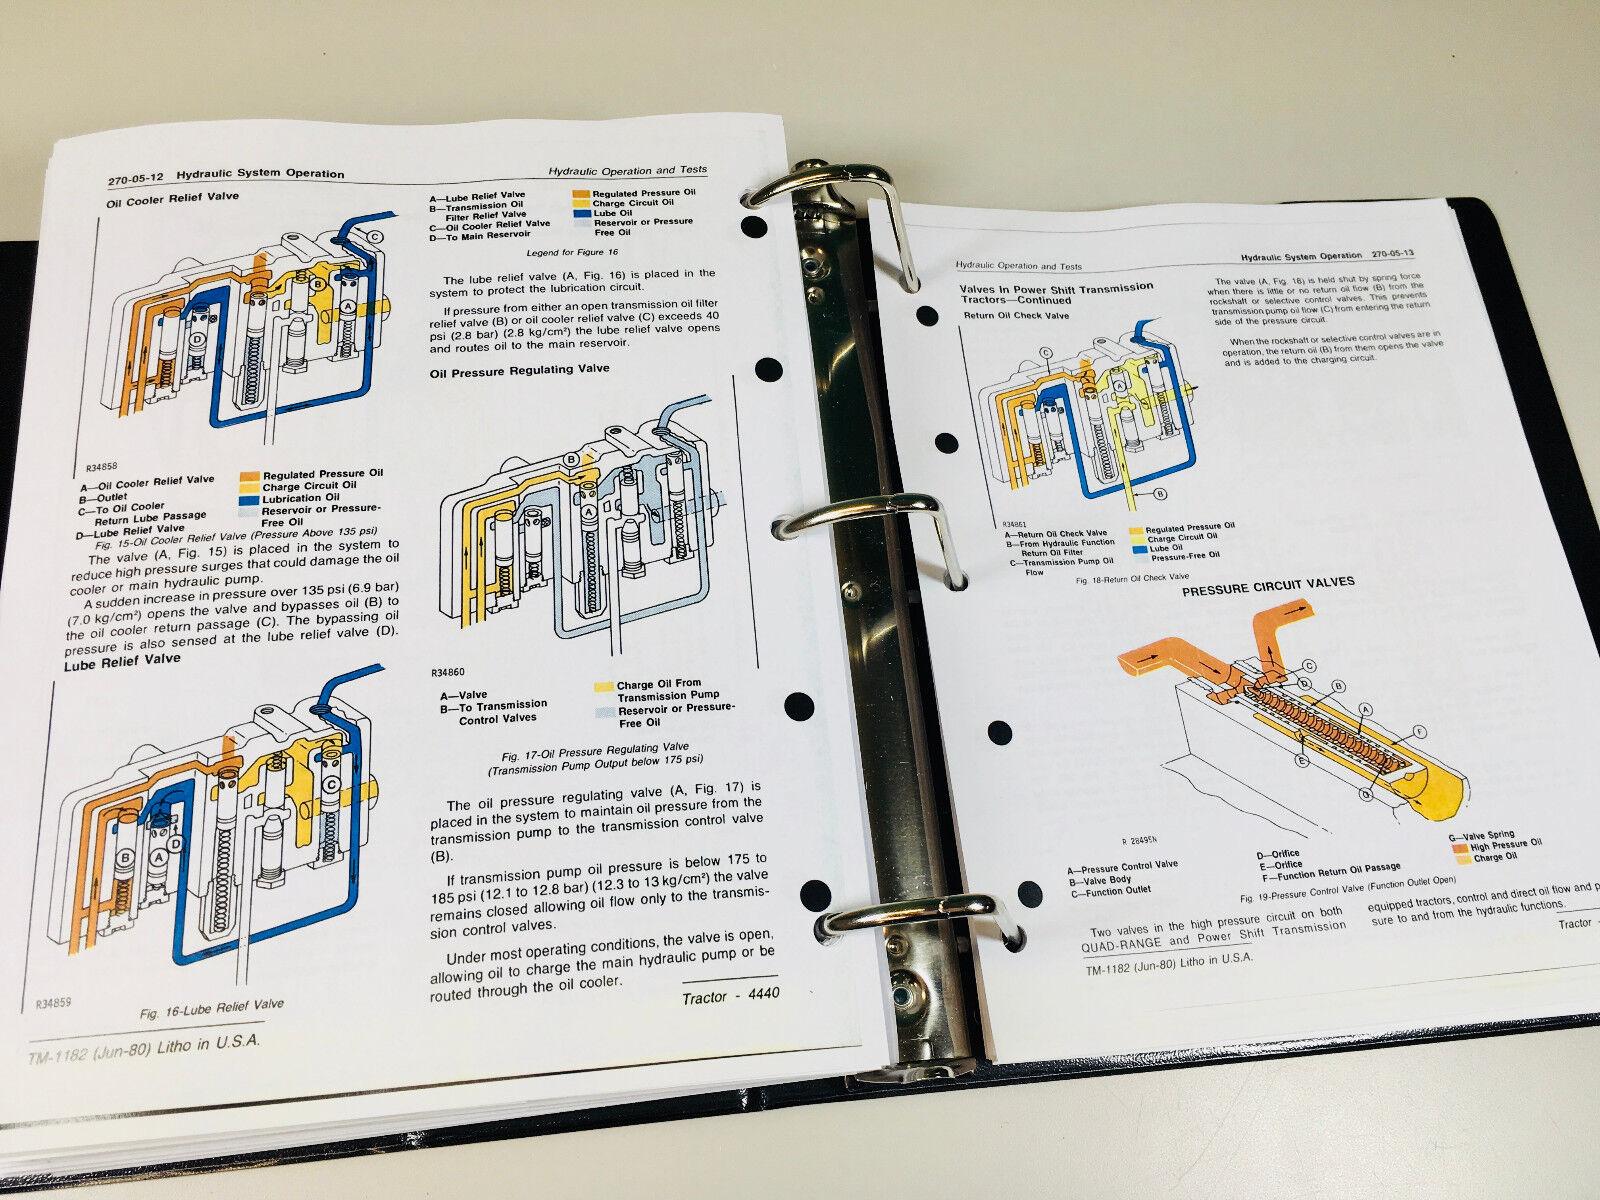 John Deere 4440 Tractor Service Manual Technical Repair Shop Book Overhaul  | eBay